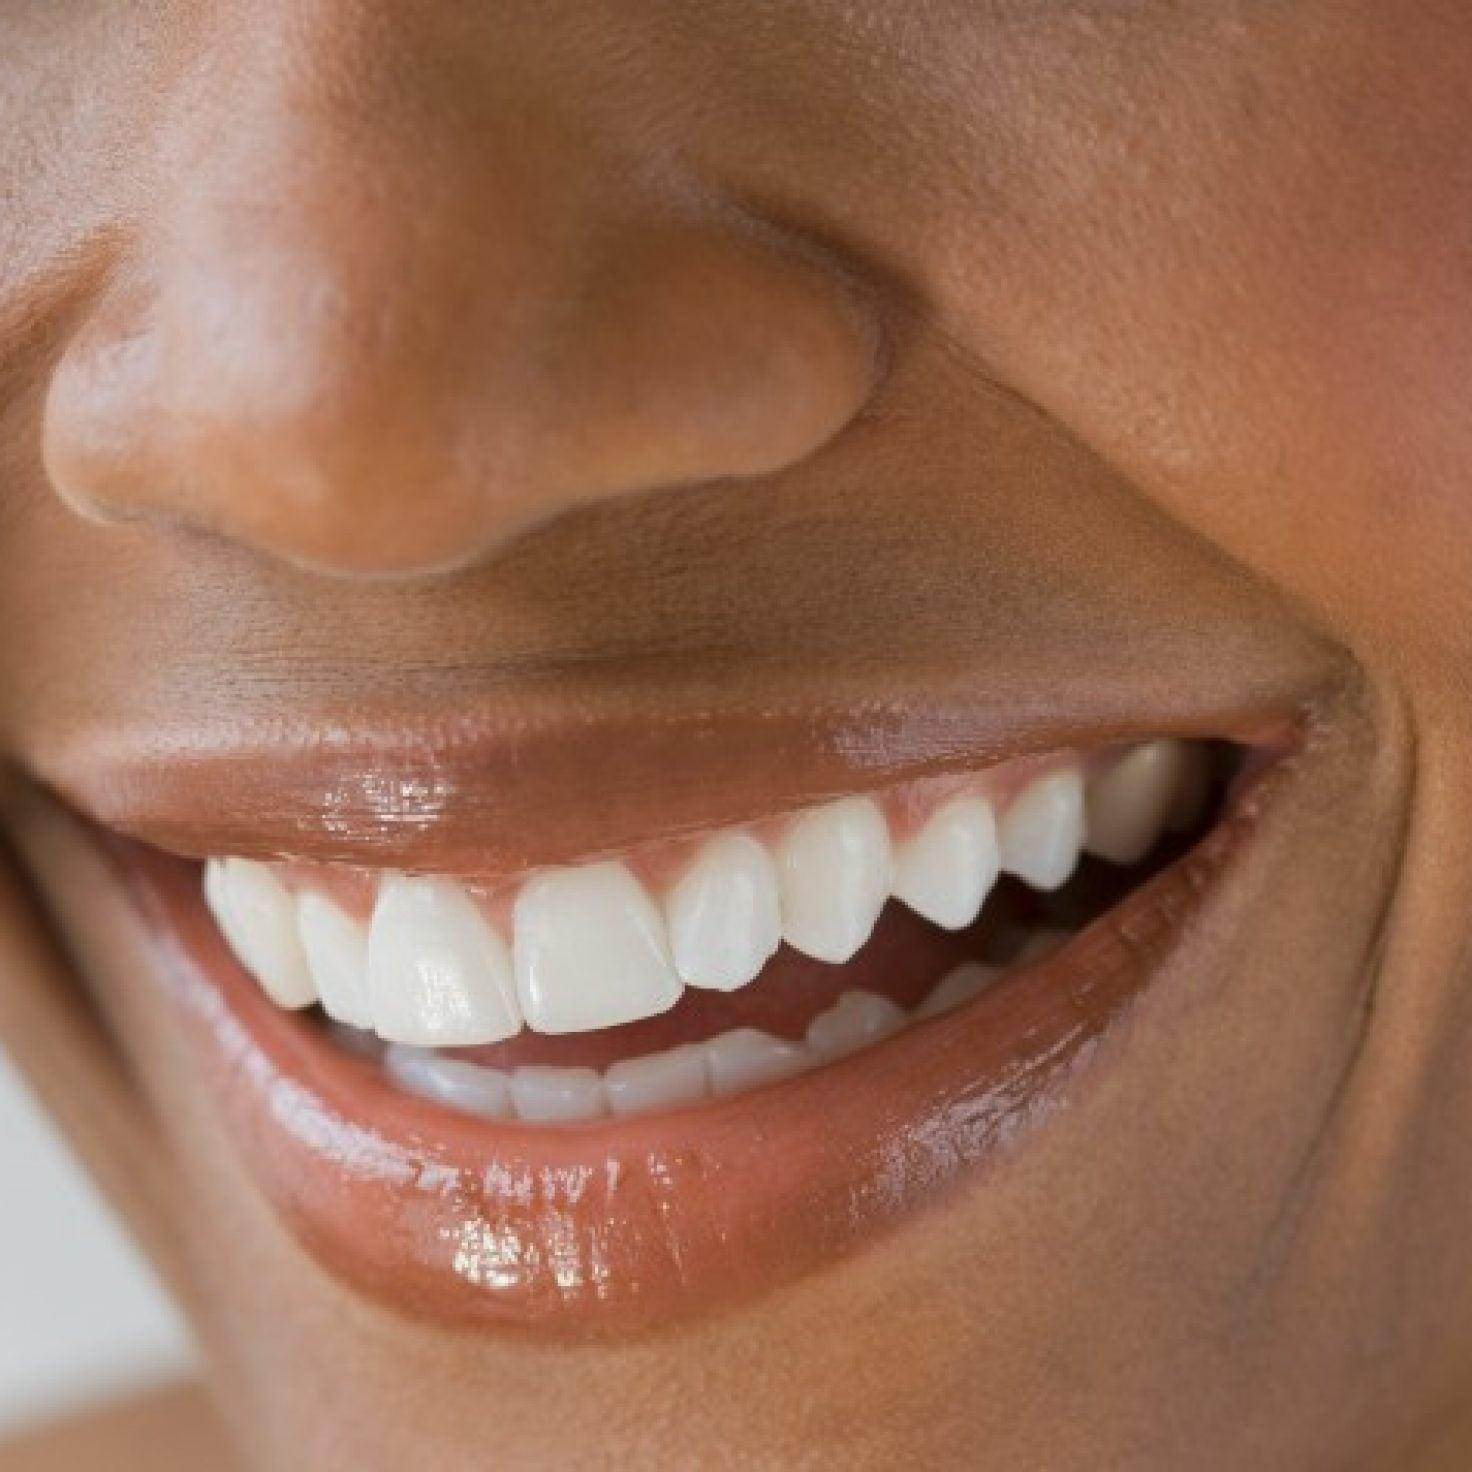 5 Non-Stick Lip Glosses Your Chapped Lips Will Love